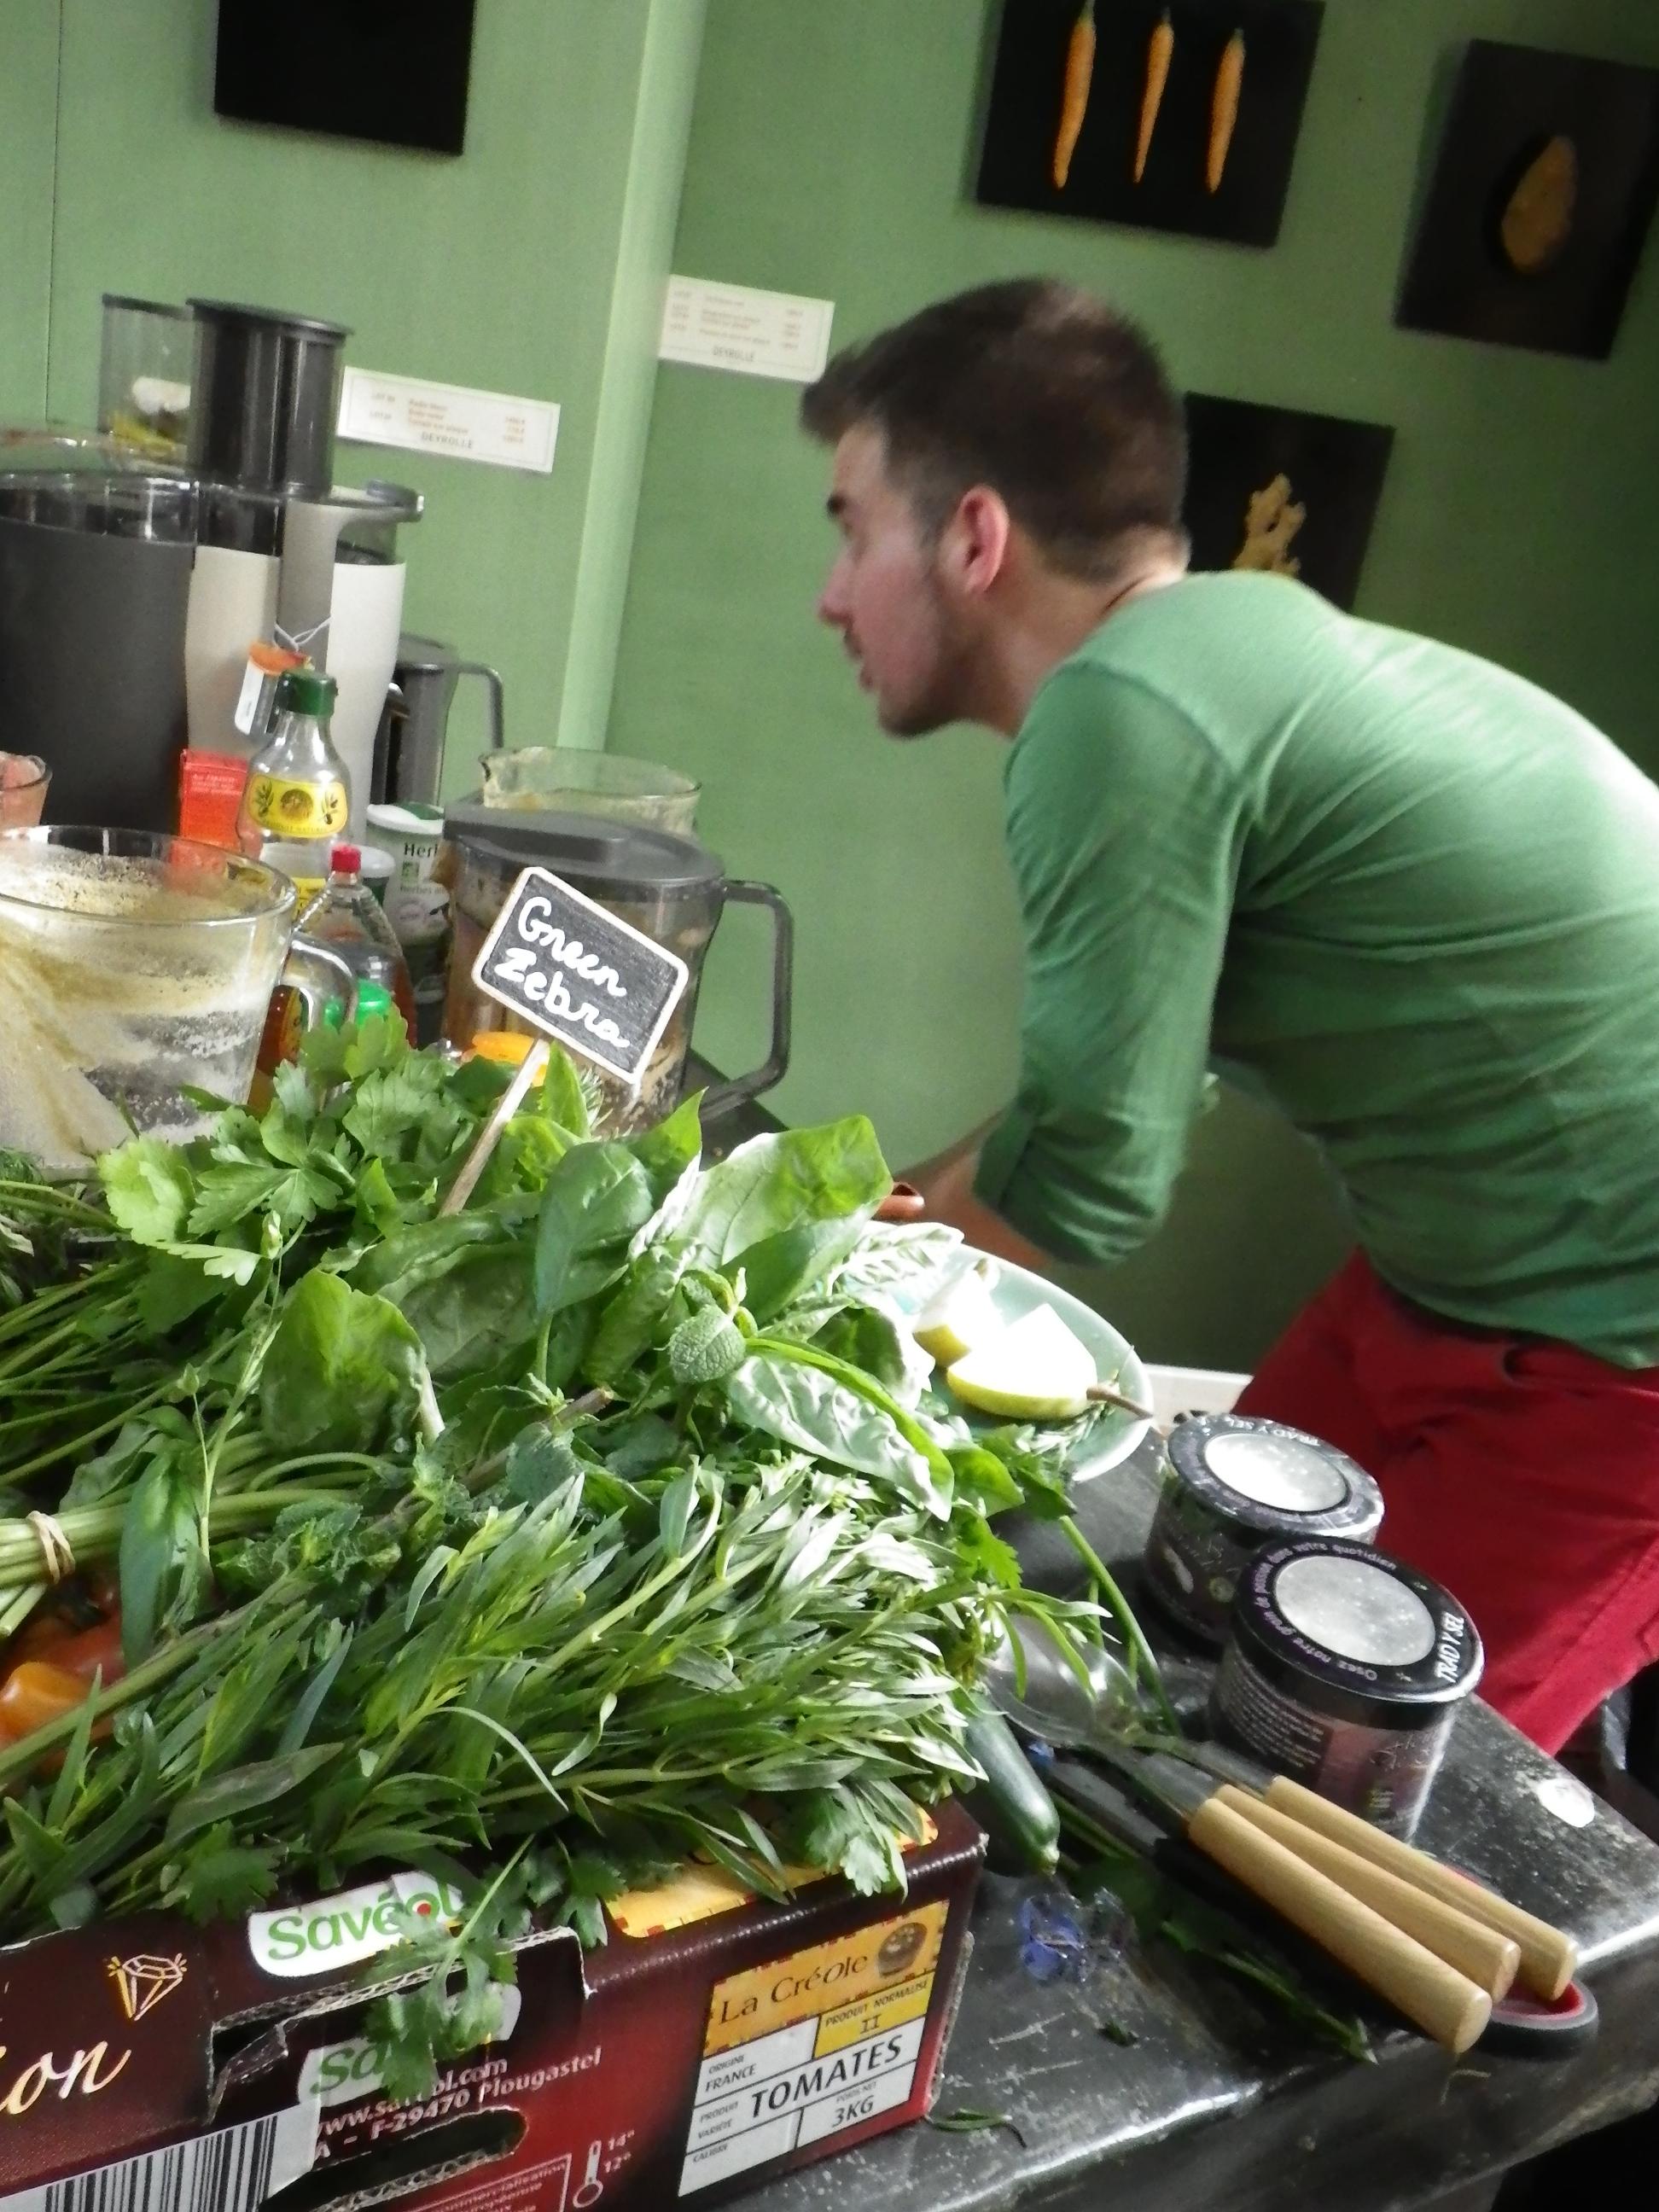 Bar tomates bien dans ma cuisine for J apprends a cuisiner